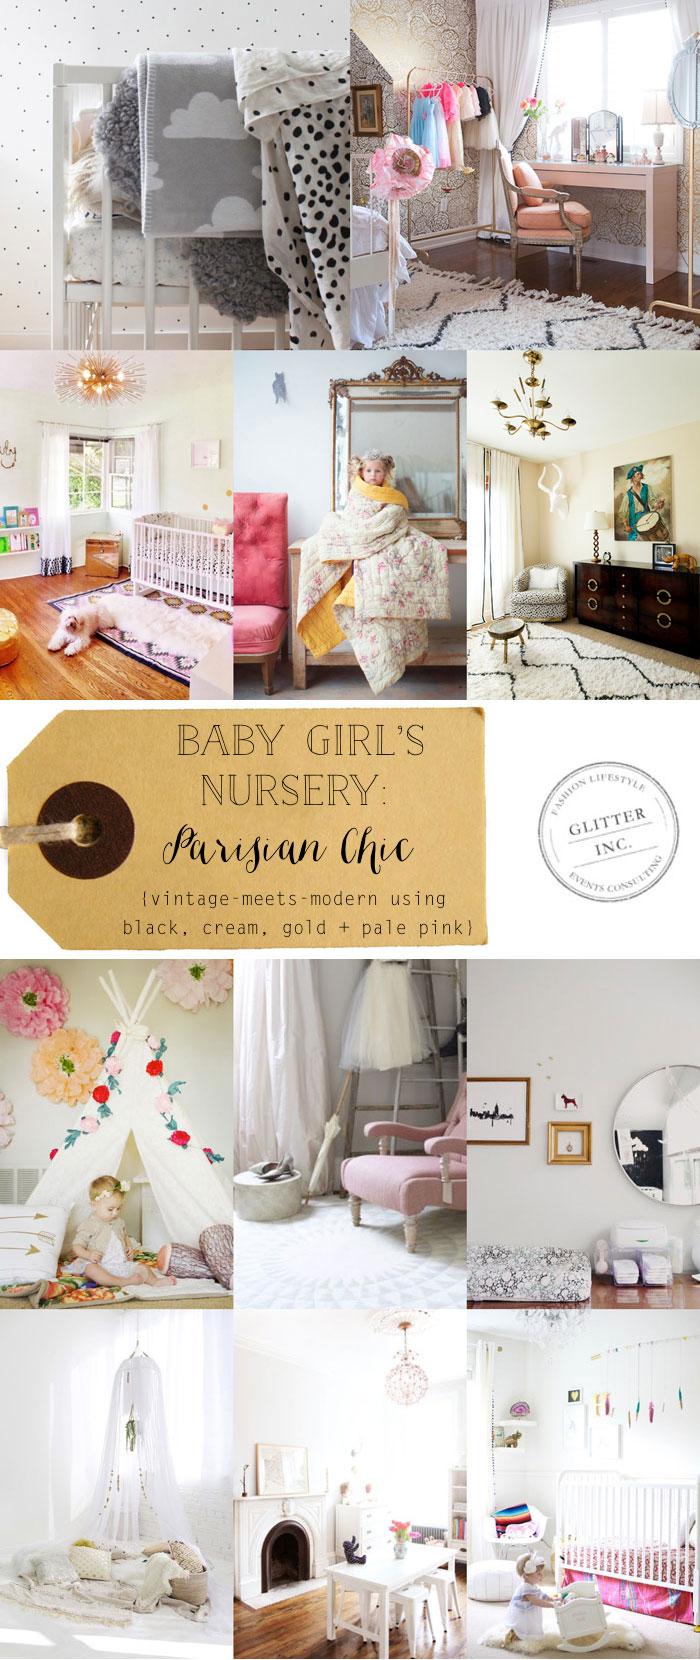 baby-girl-nursery-paris-parisian-chic-black-cream-gold-souk-rug-pale-pink---inspiration---glitterinc.com